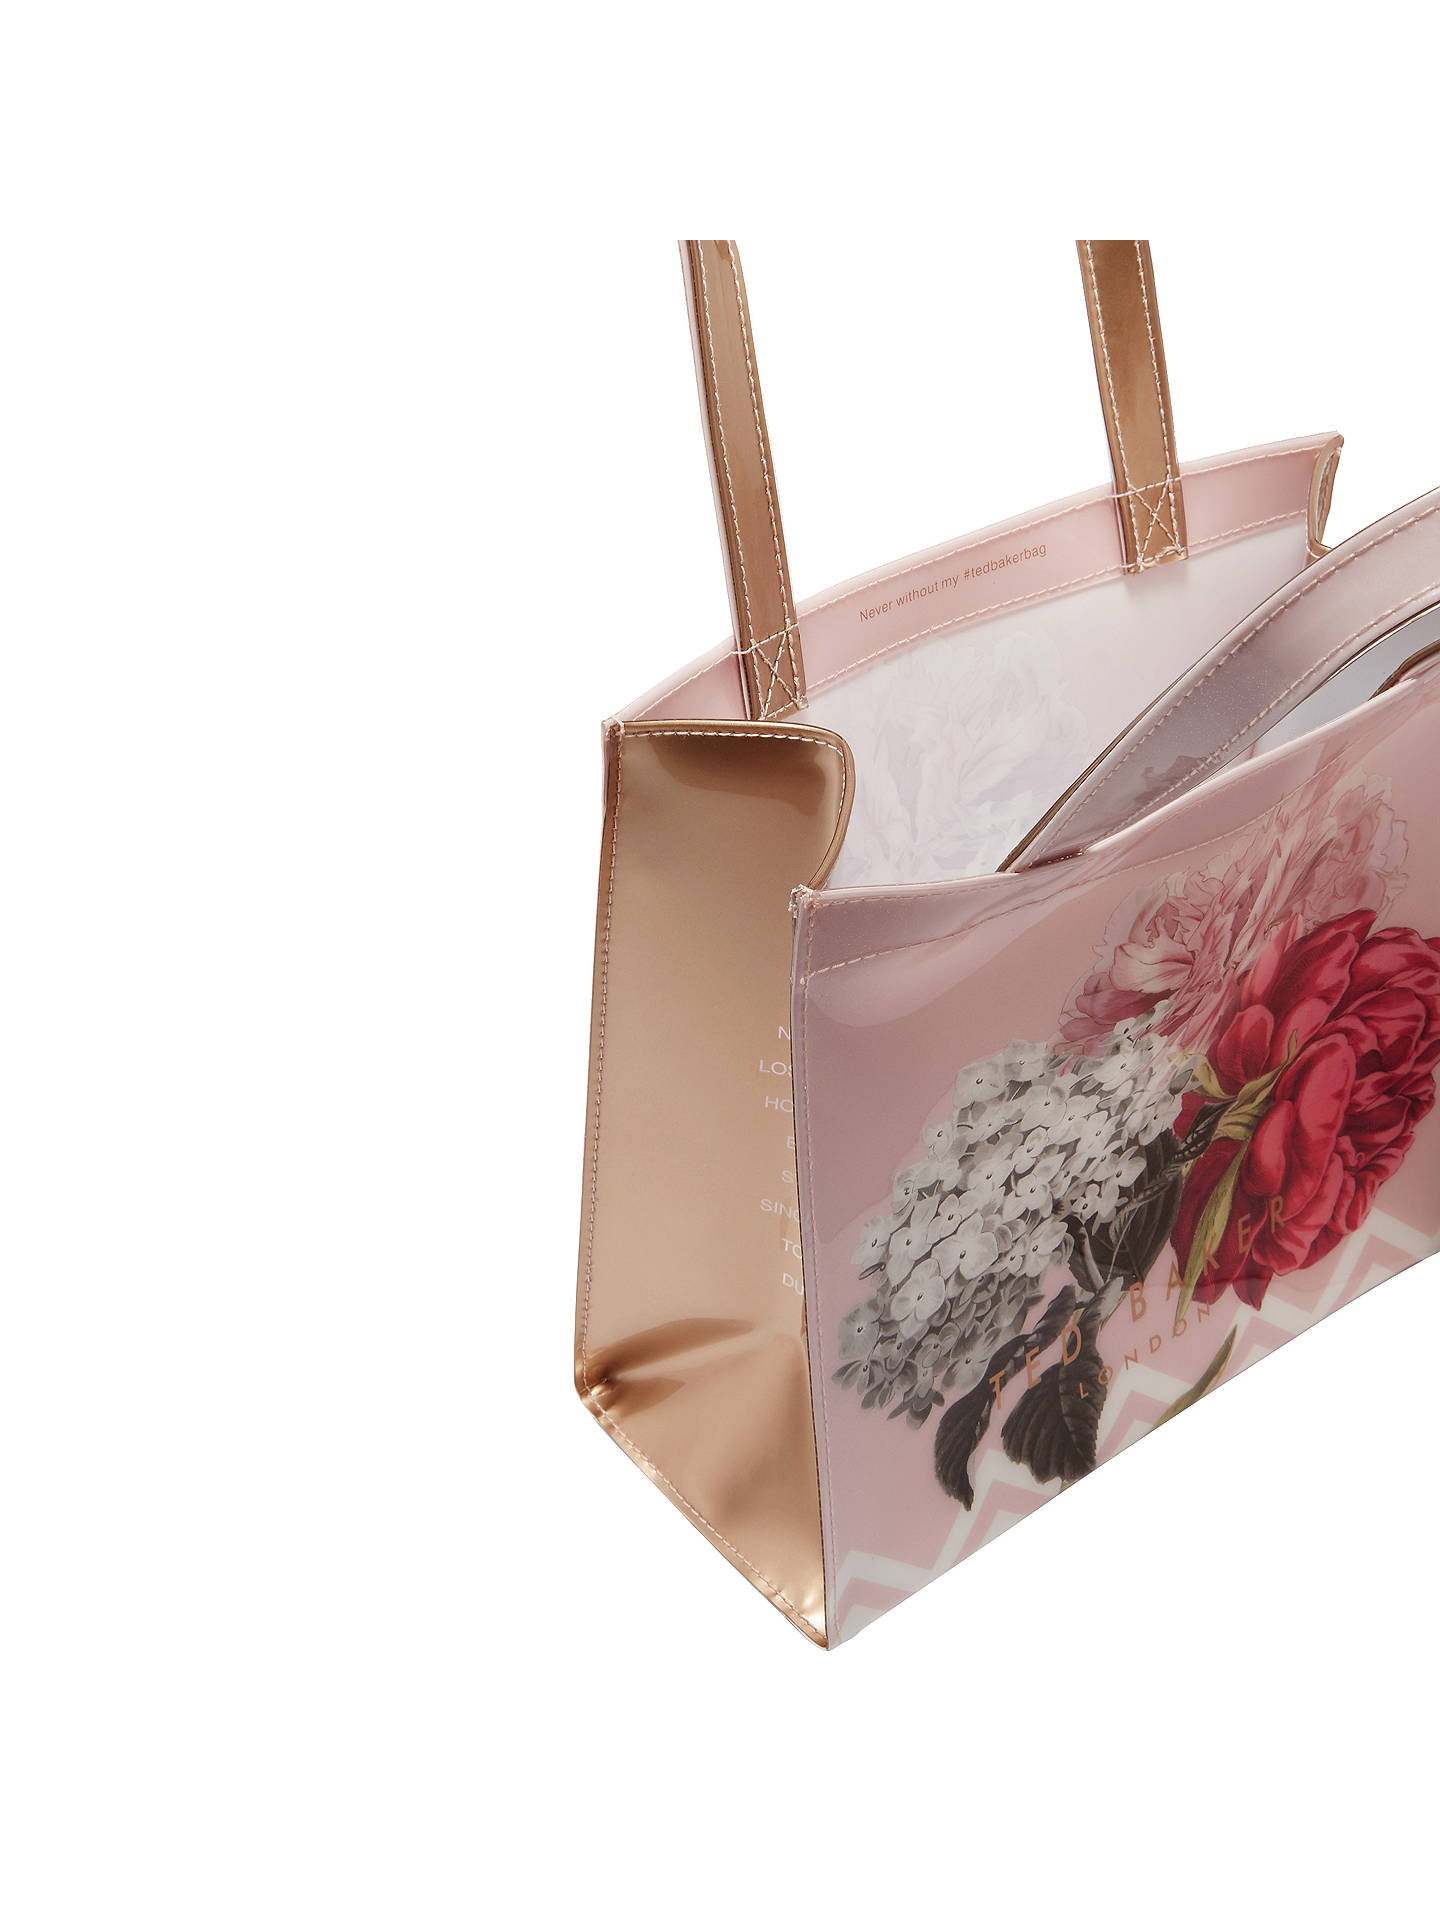 a2815d187920 Buy Ted Baker Chaicon Palace Gardens Small Shopper Bag